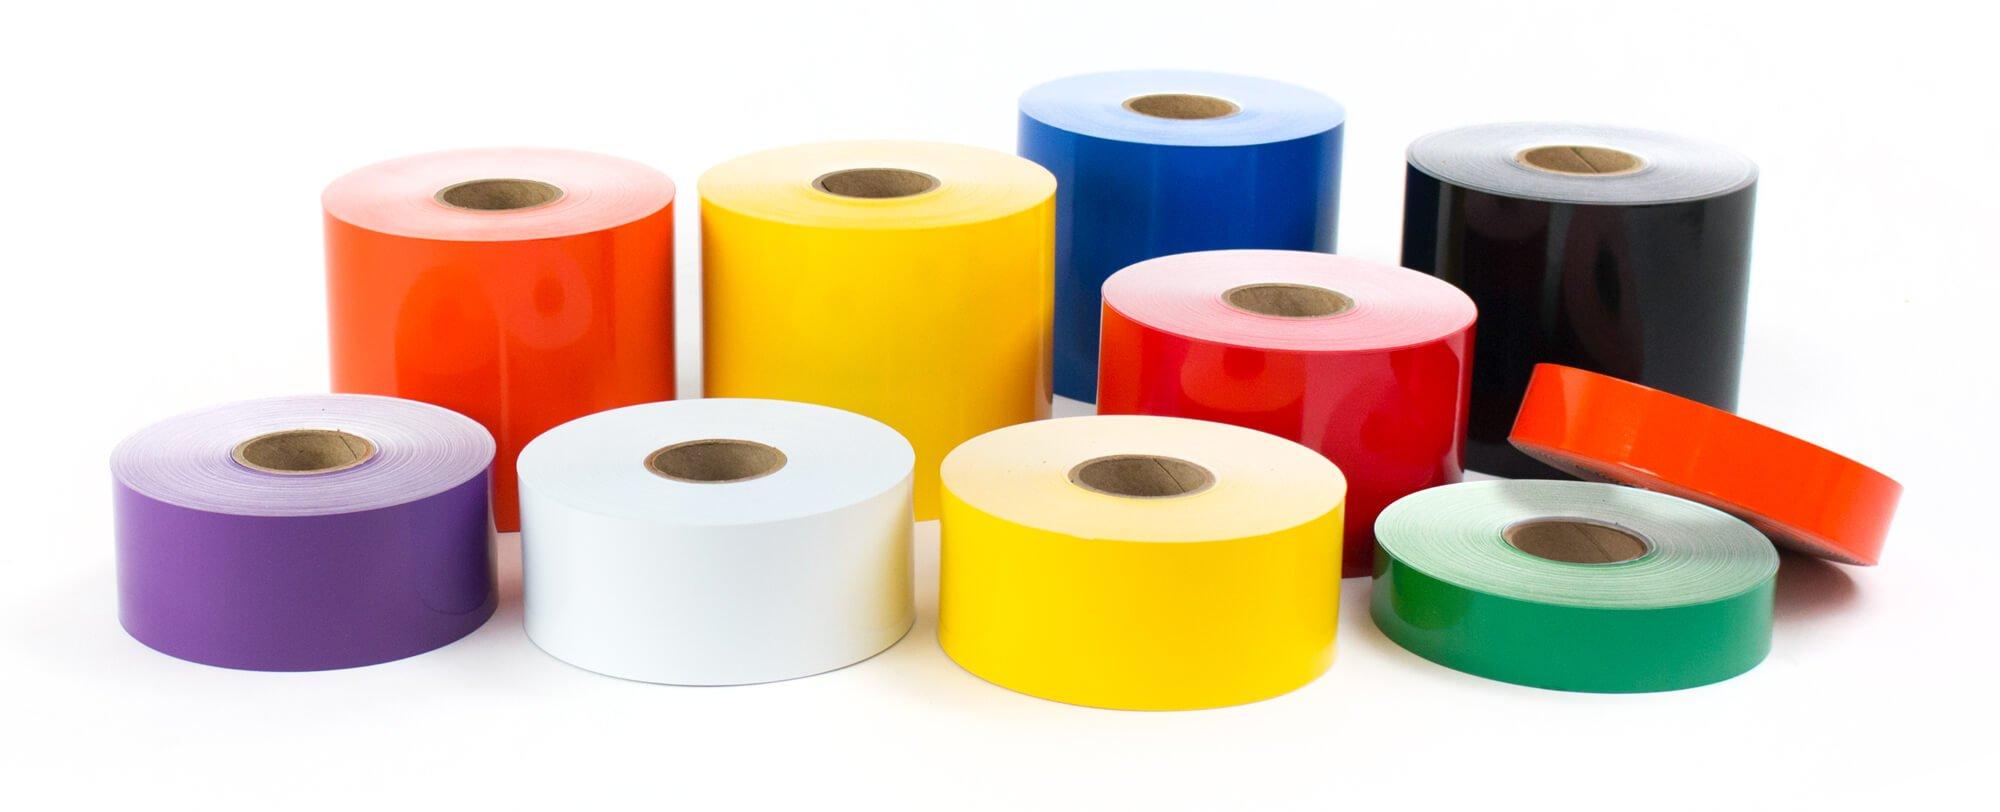 labeltac supplies